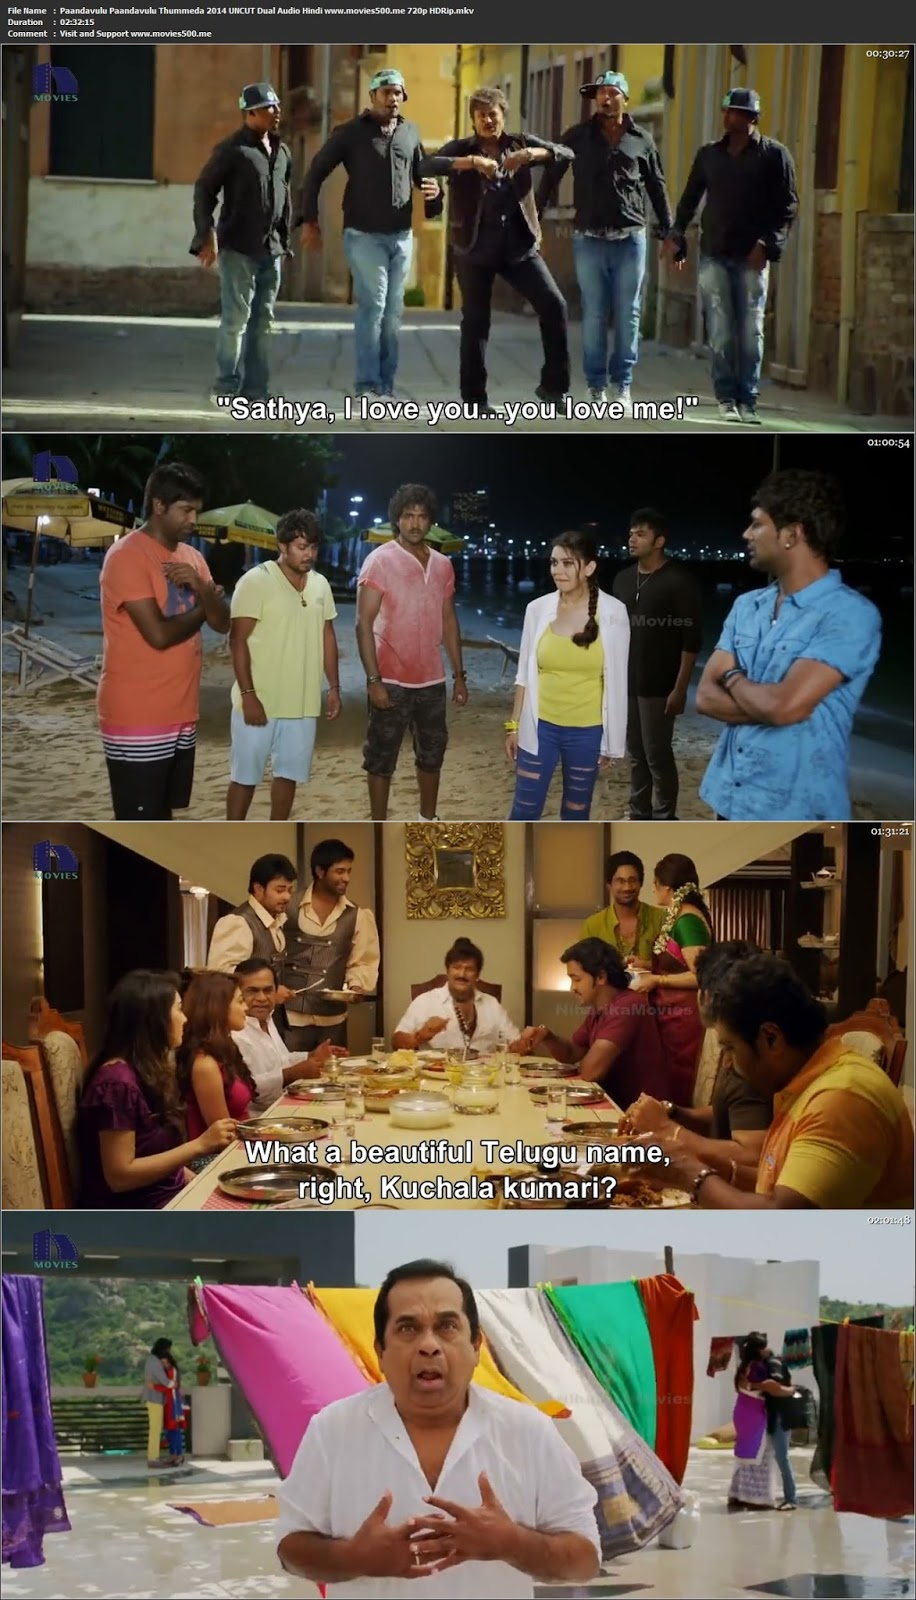 Paandavulu Paandavulu Thummeda 2014 UNCUT Dual Audio Hindi HDRip 720p at movies500.bid